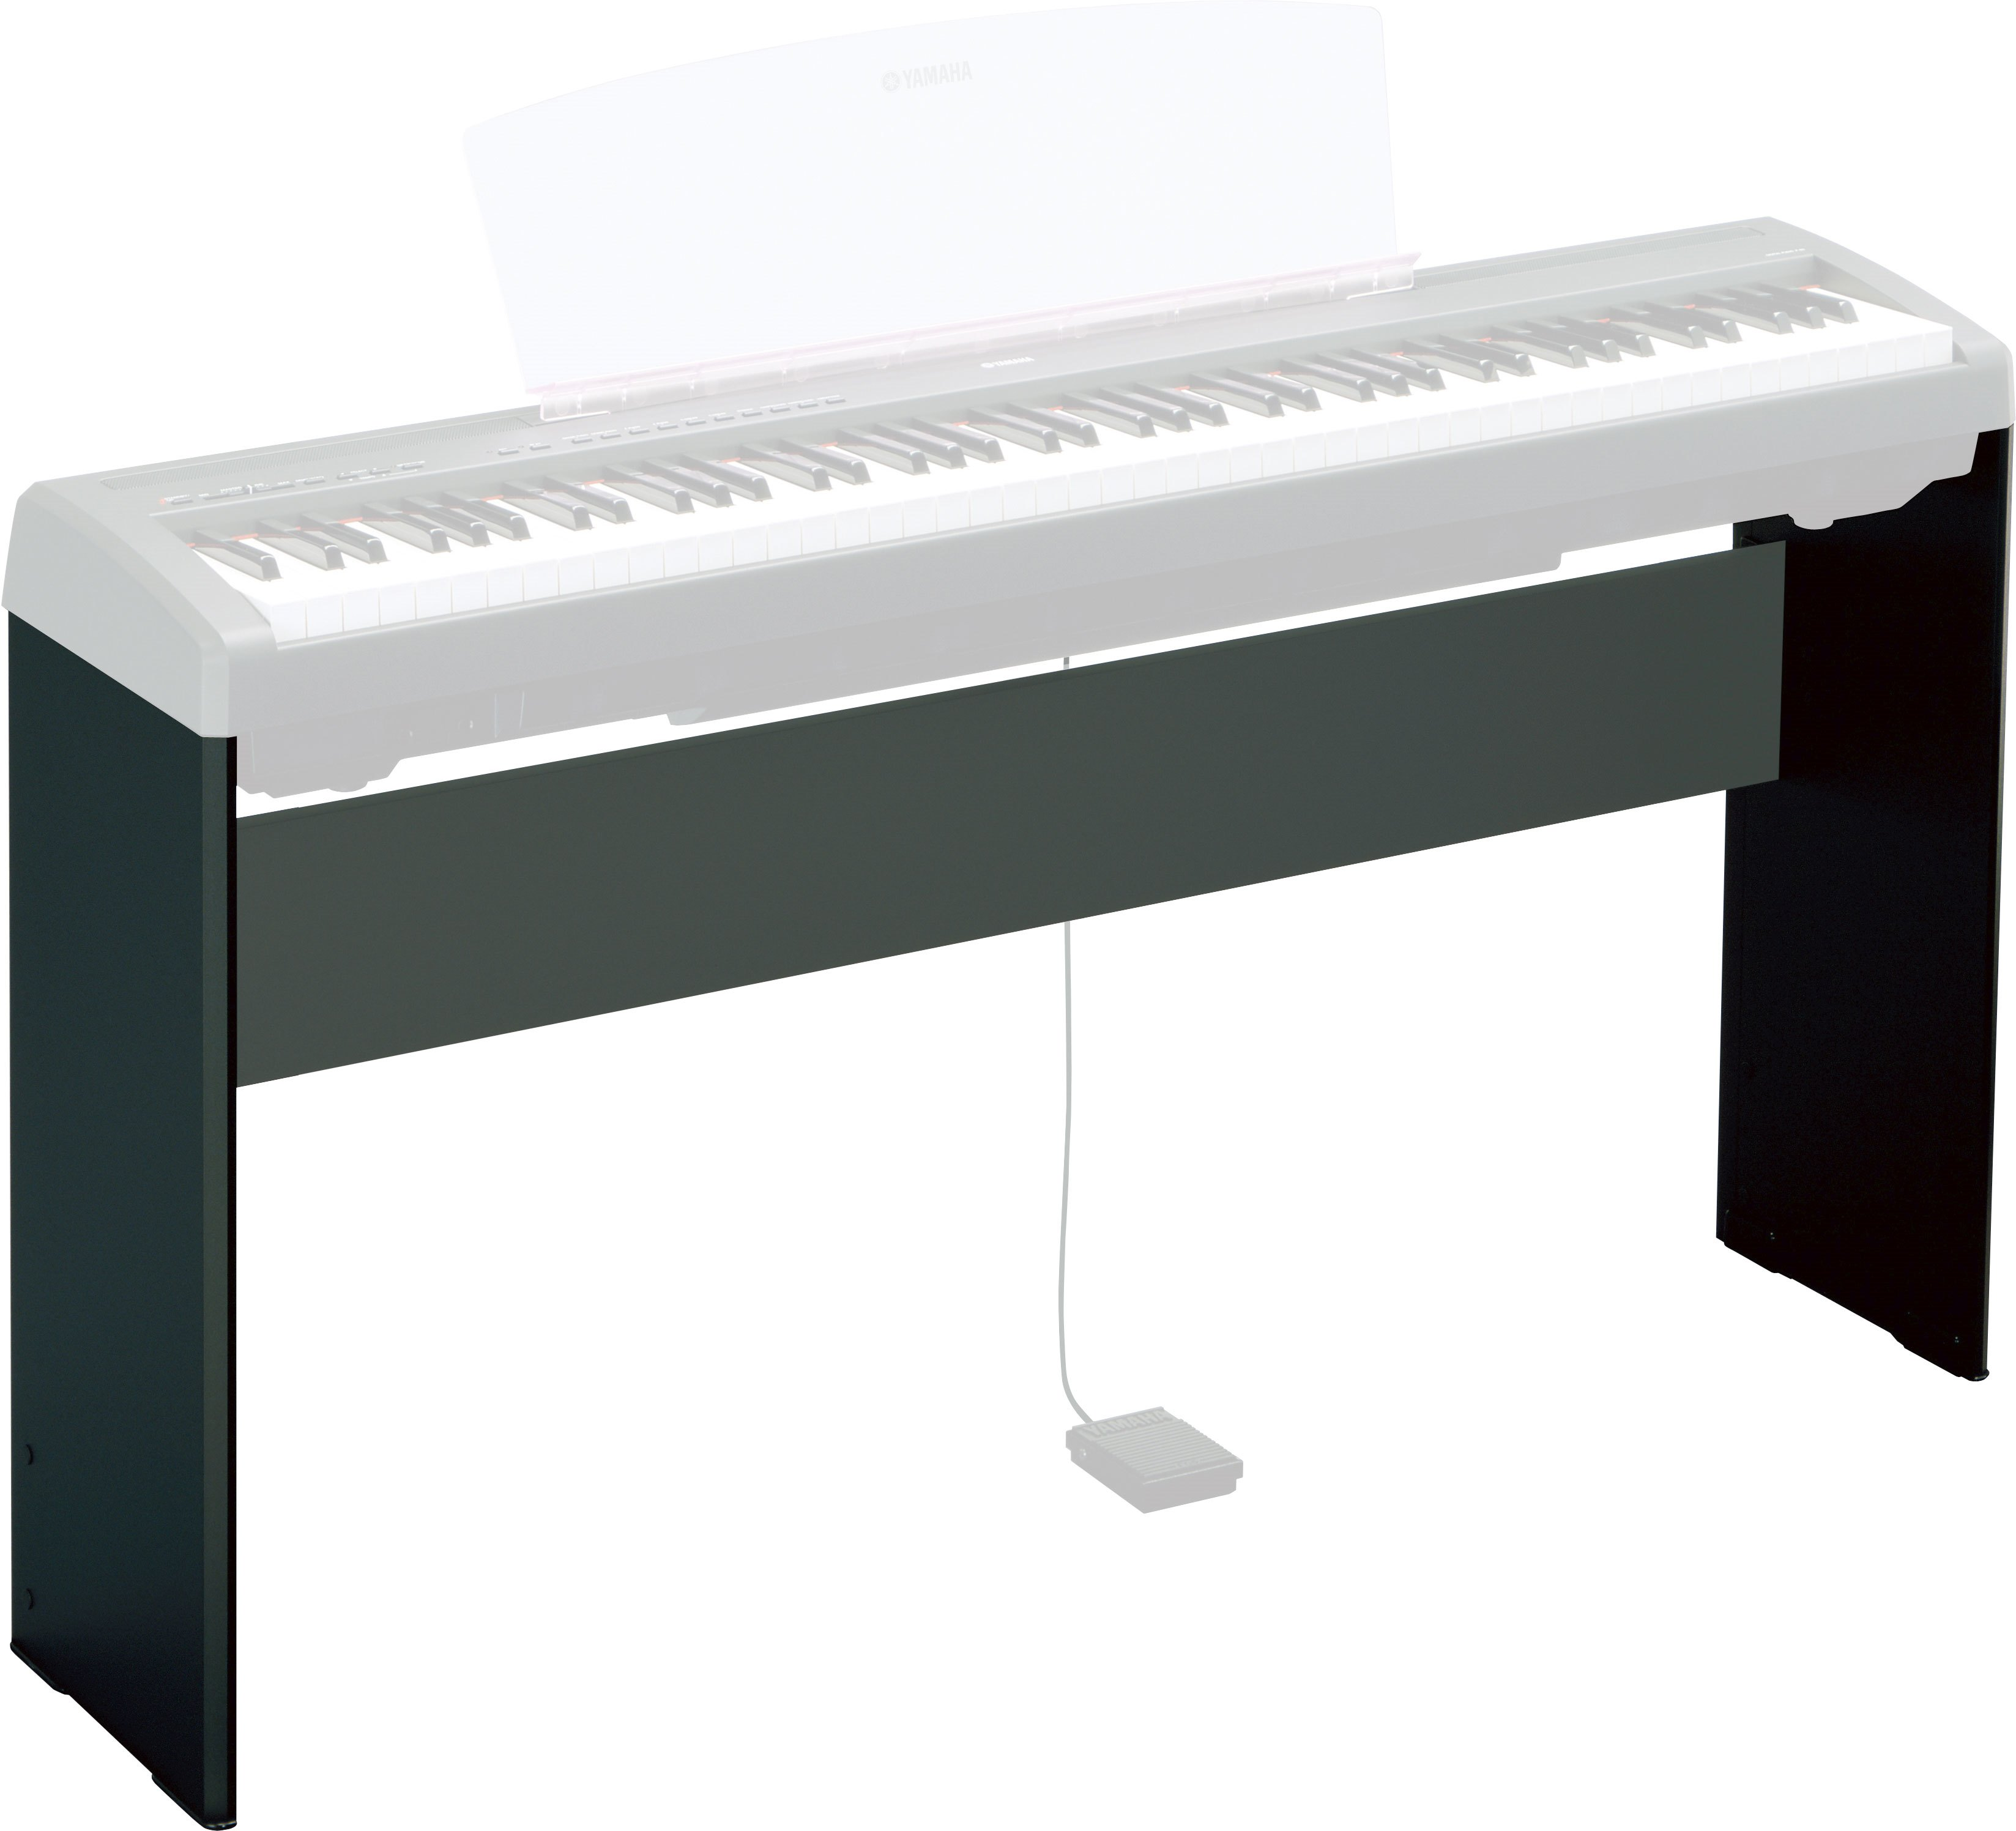 l 85 overview yamaha united states rh usa yamaha com Piano Yamaha So8 Manuals Yamaha Piano Notes